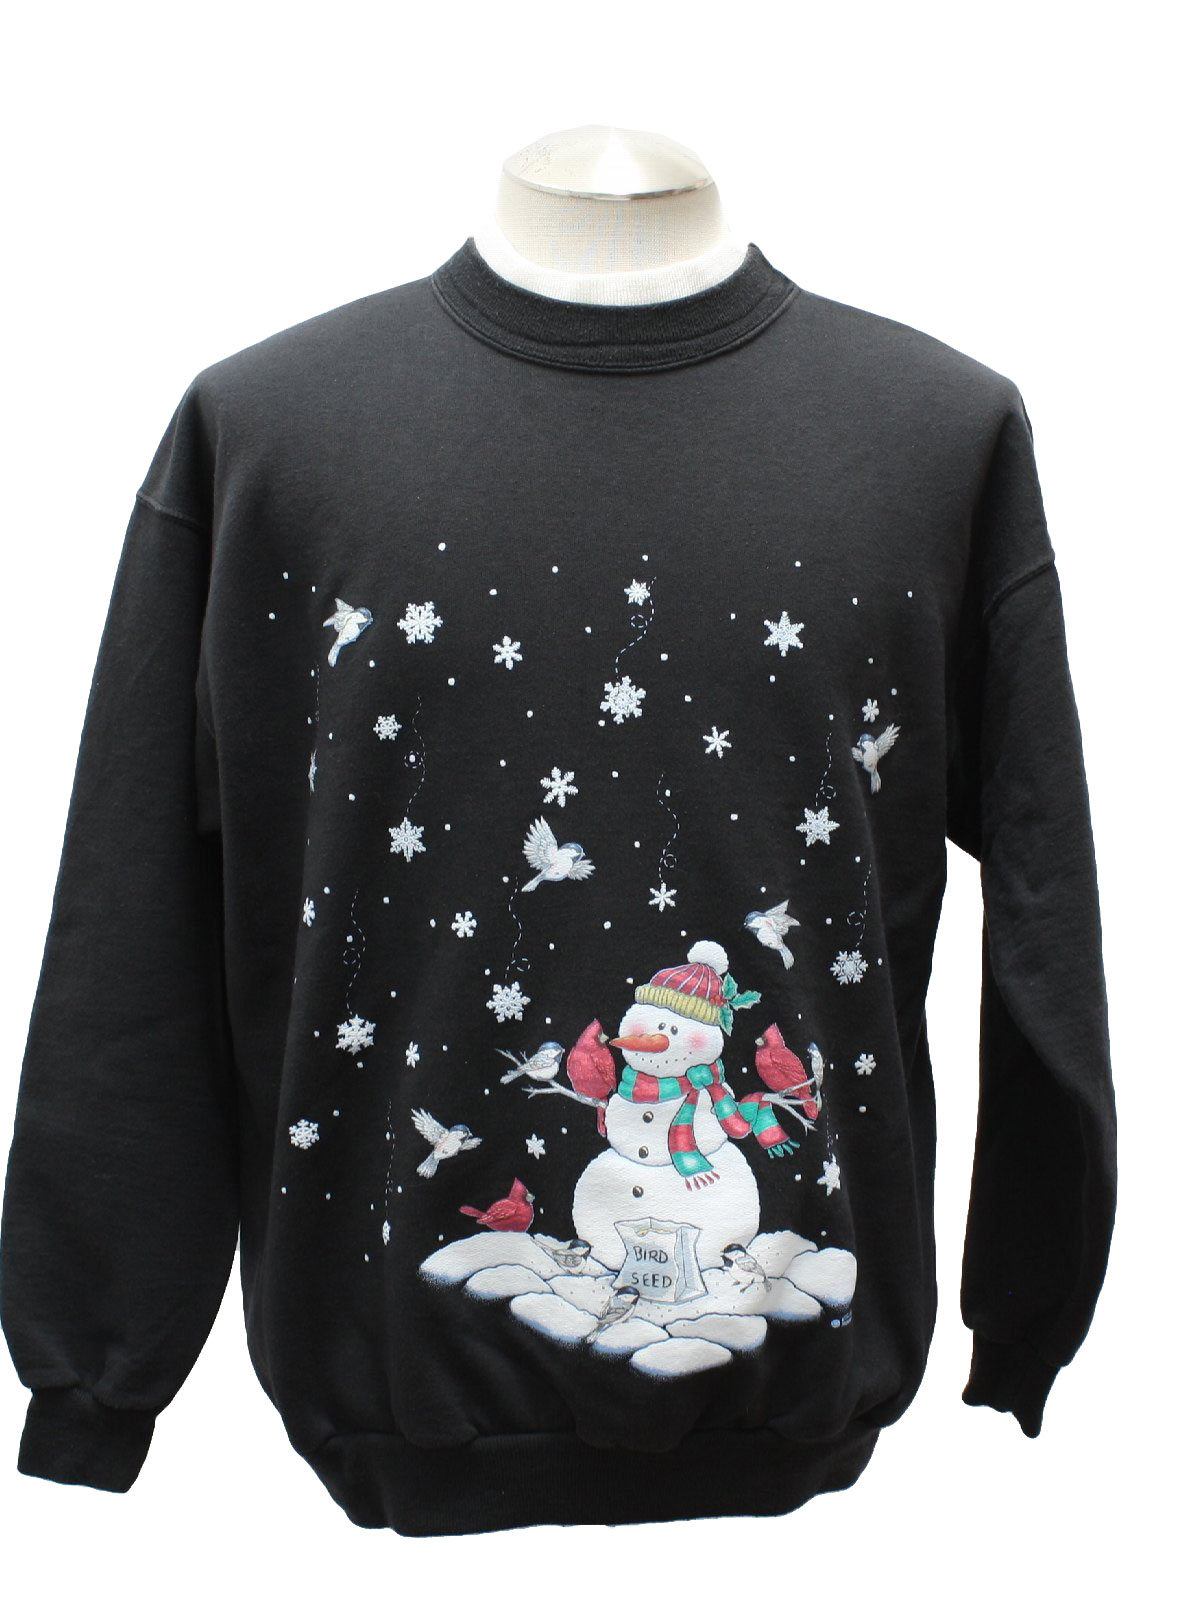 Ugly Christmas Sweatshirt Morning Sun Unisex Black